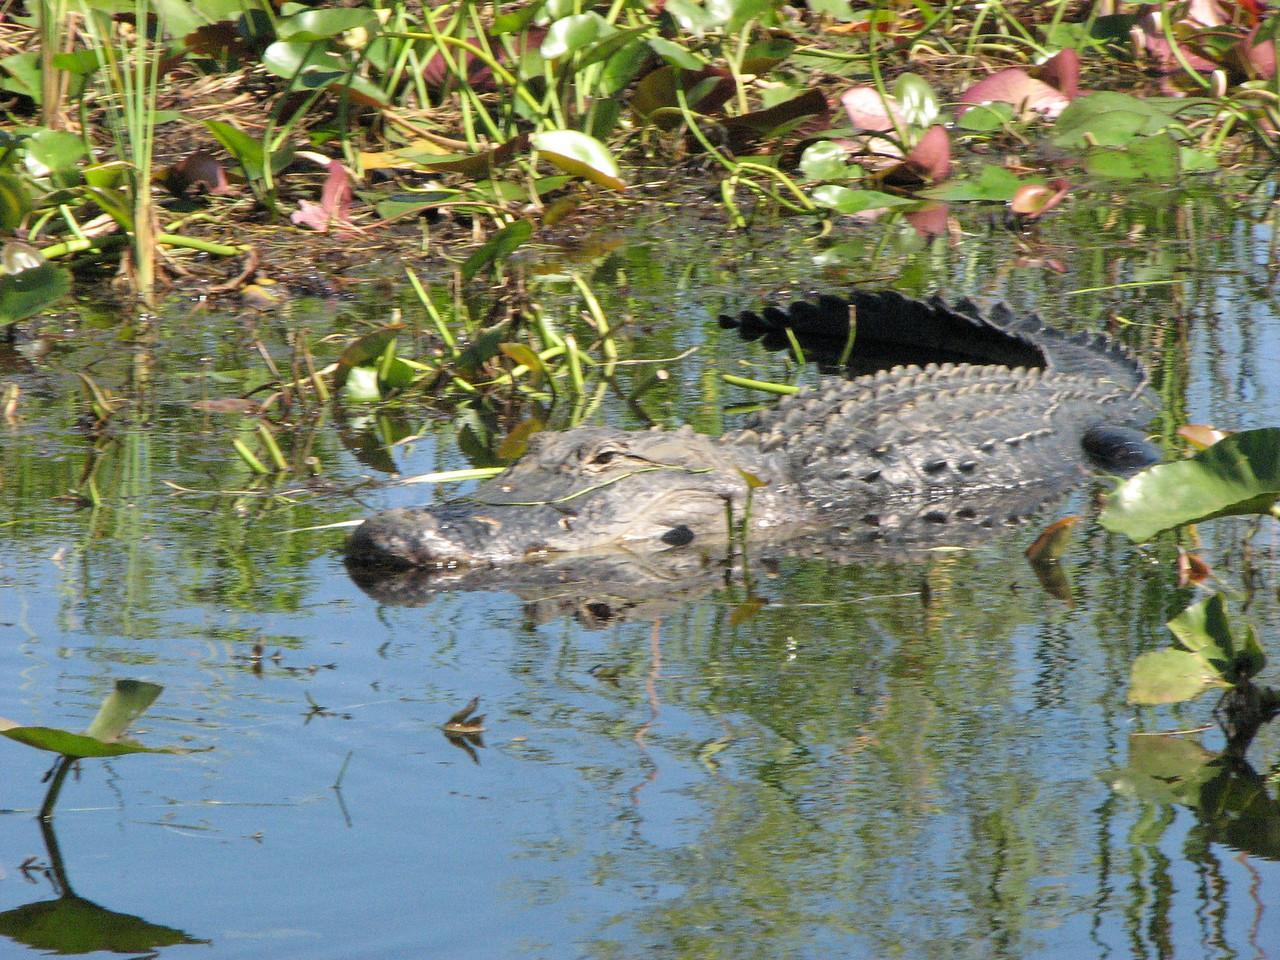 More Gators